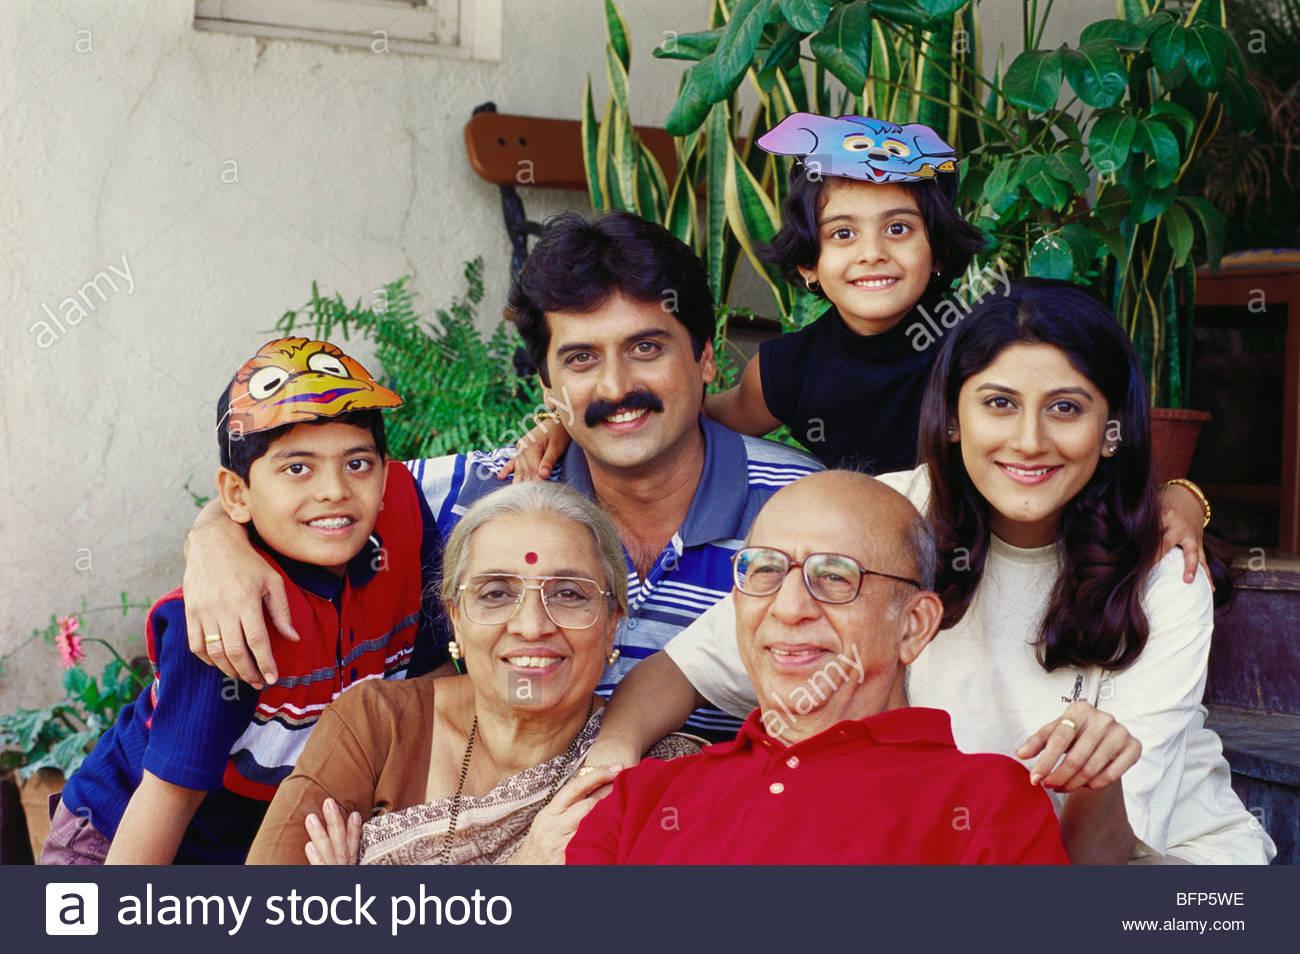 MAK 63908 : Indian Joint family MR#274;275;276;277;278;279 - Stock Image